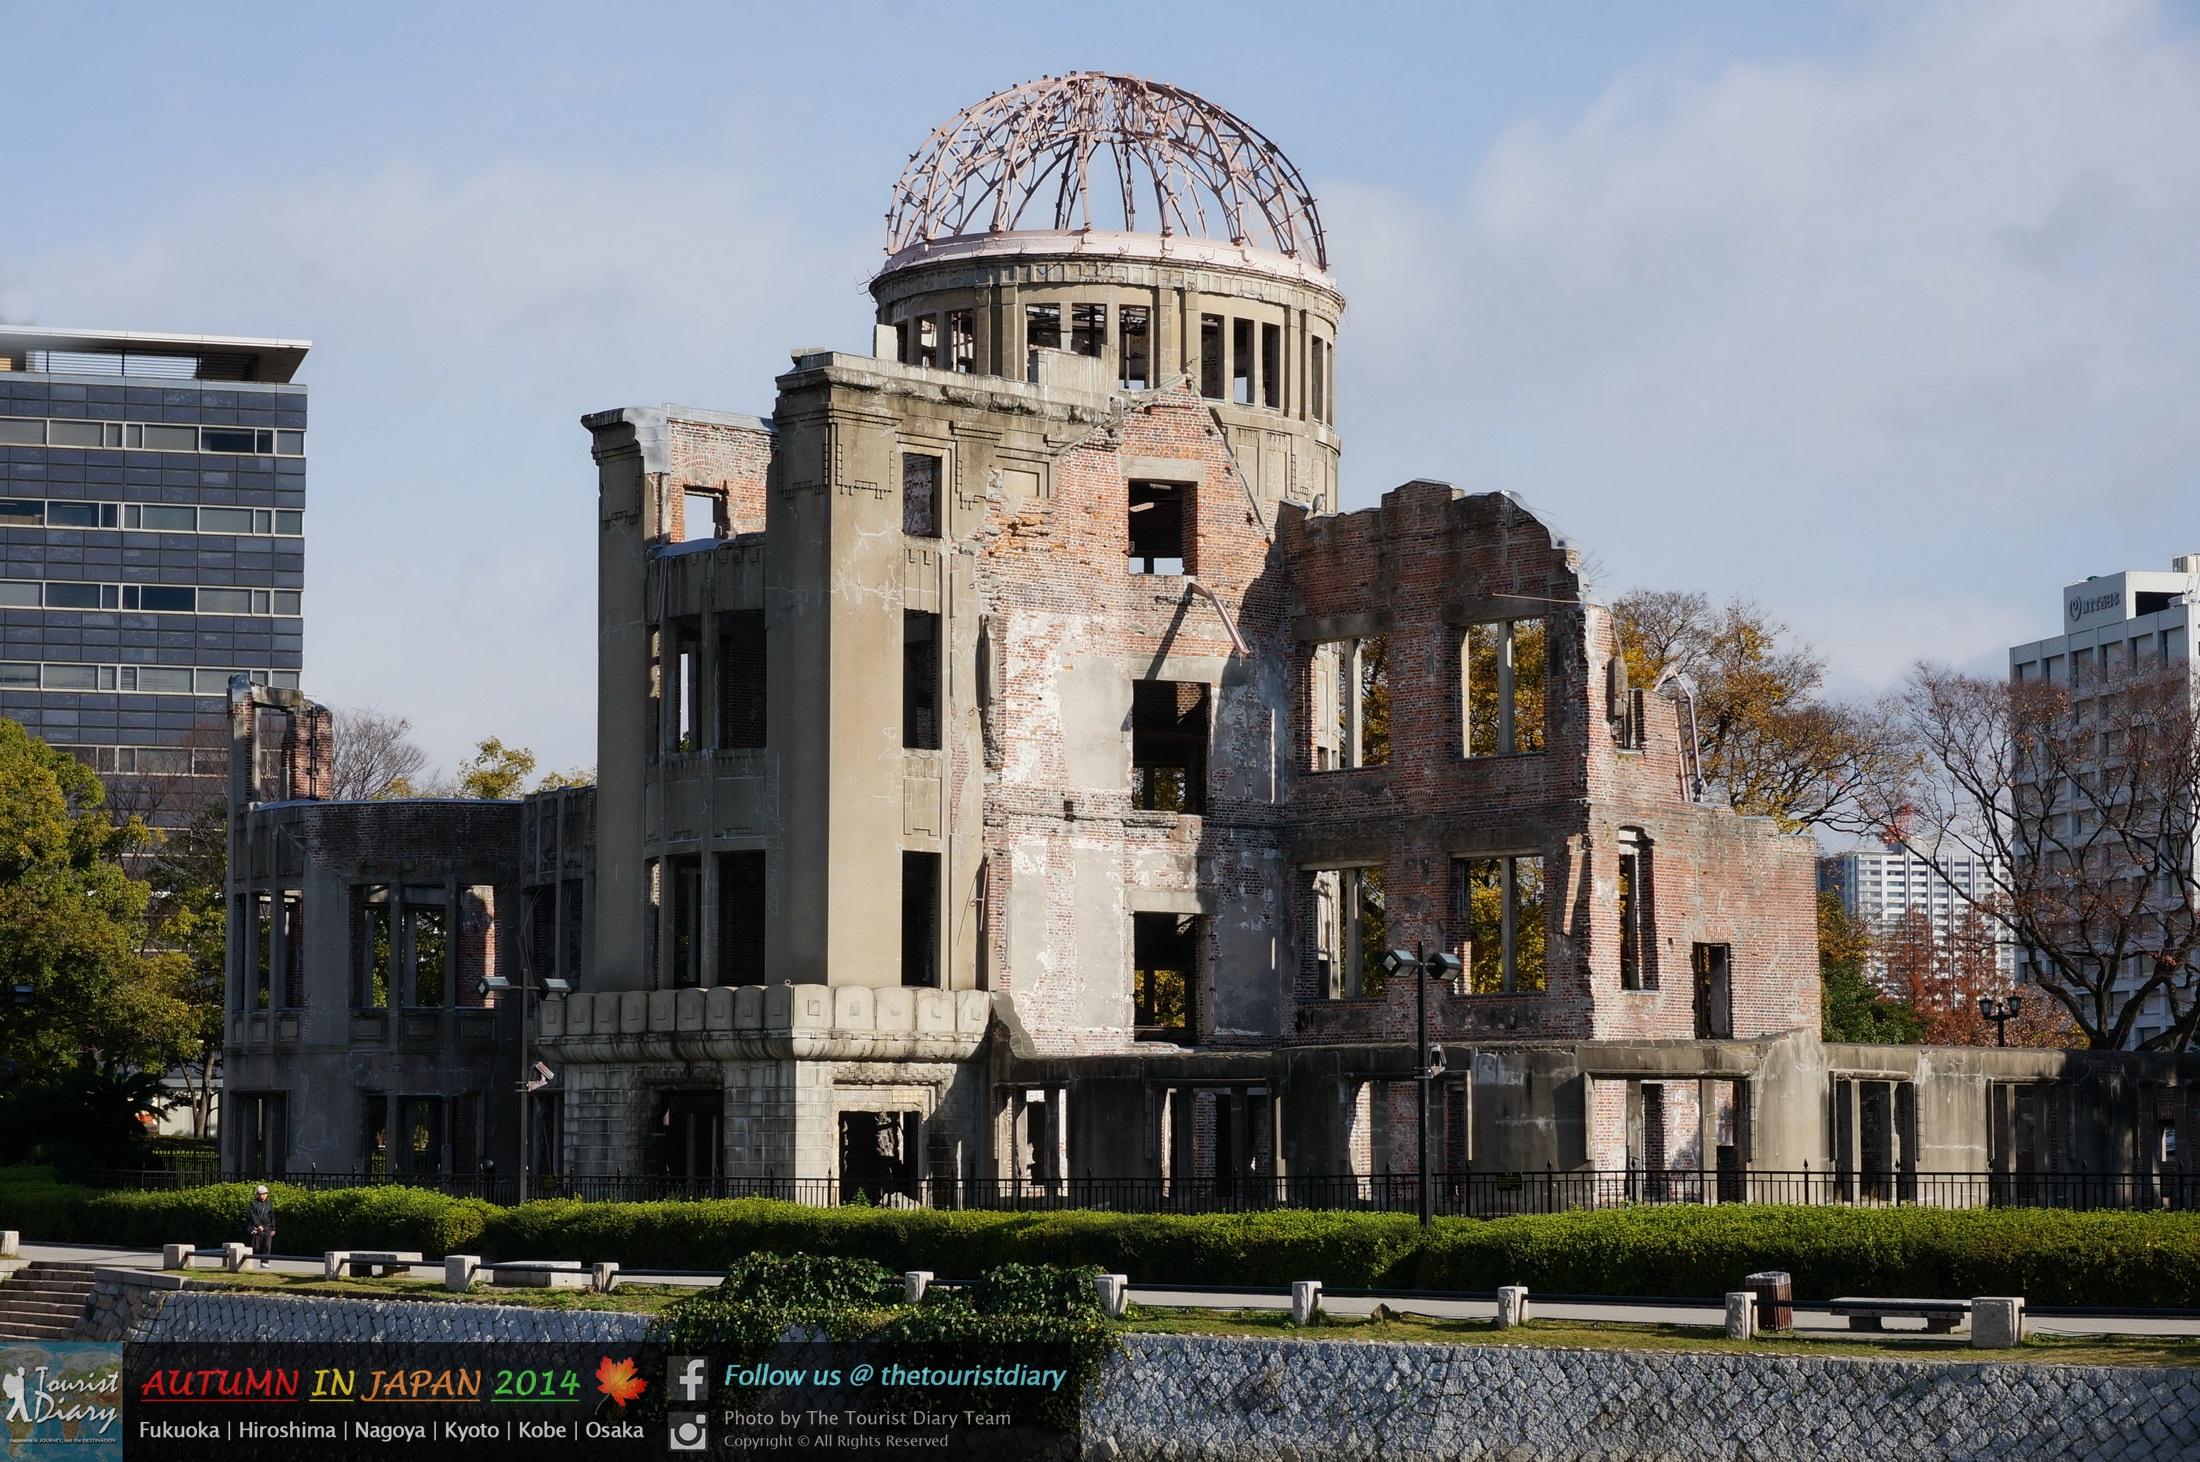 Hiroshima | Atomic Bomb Dome และสวนอนุสรณ์สันติภาพ